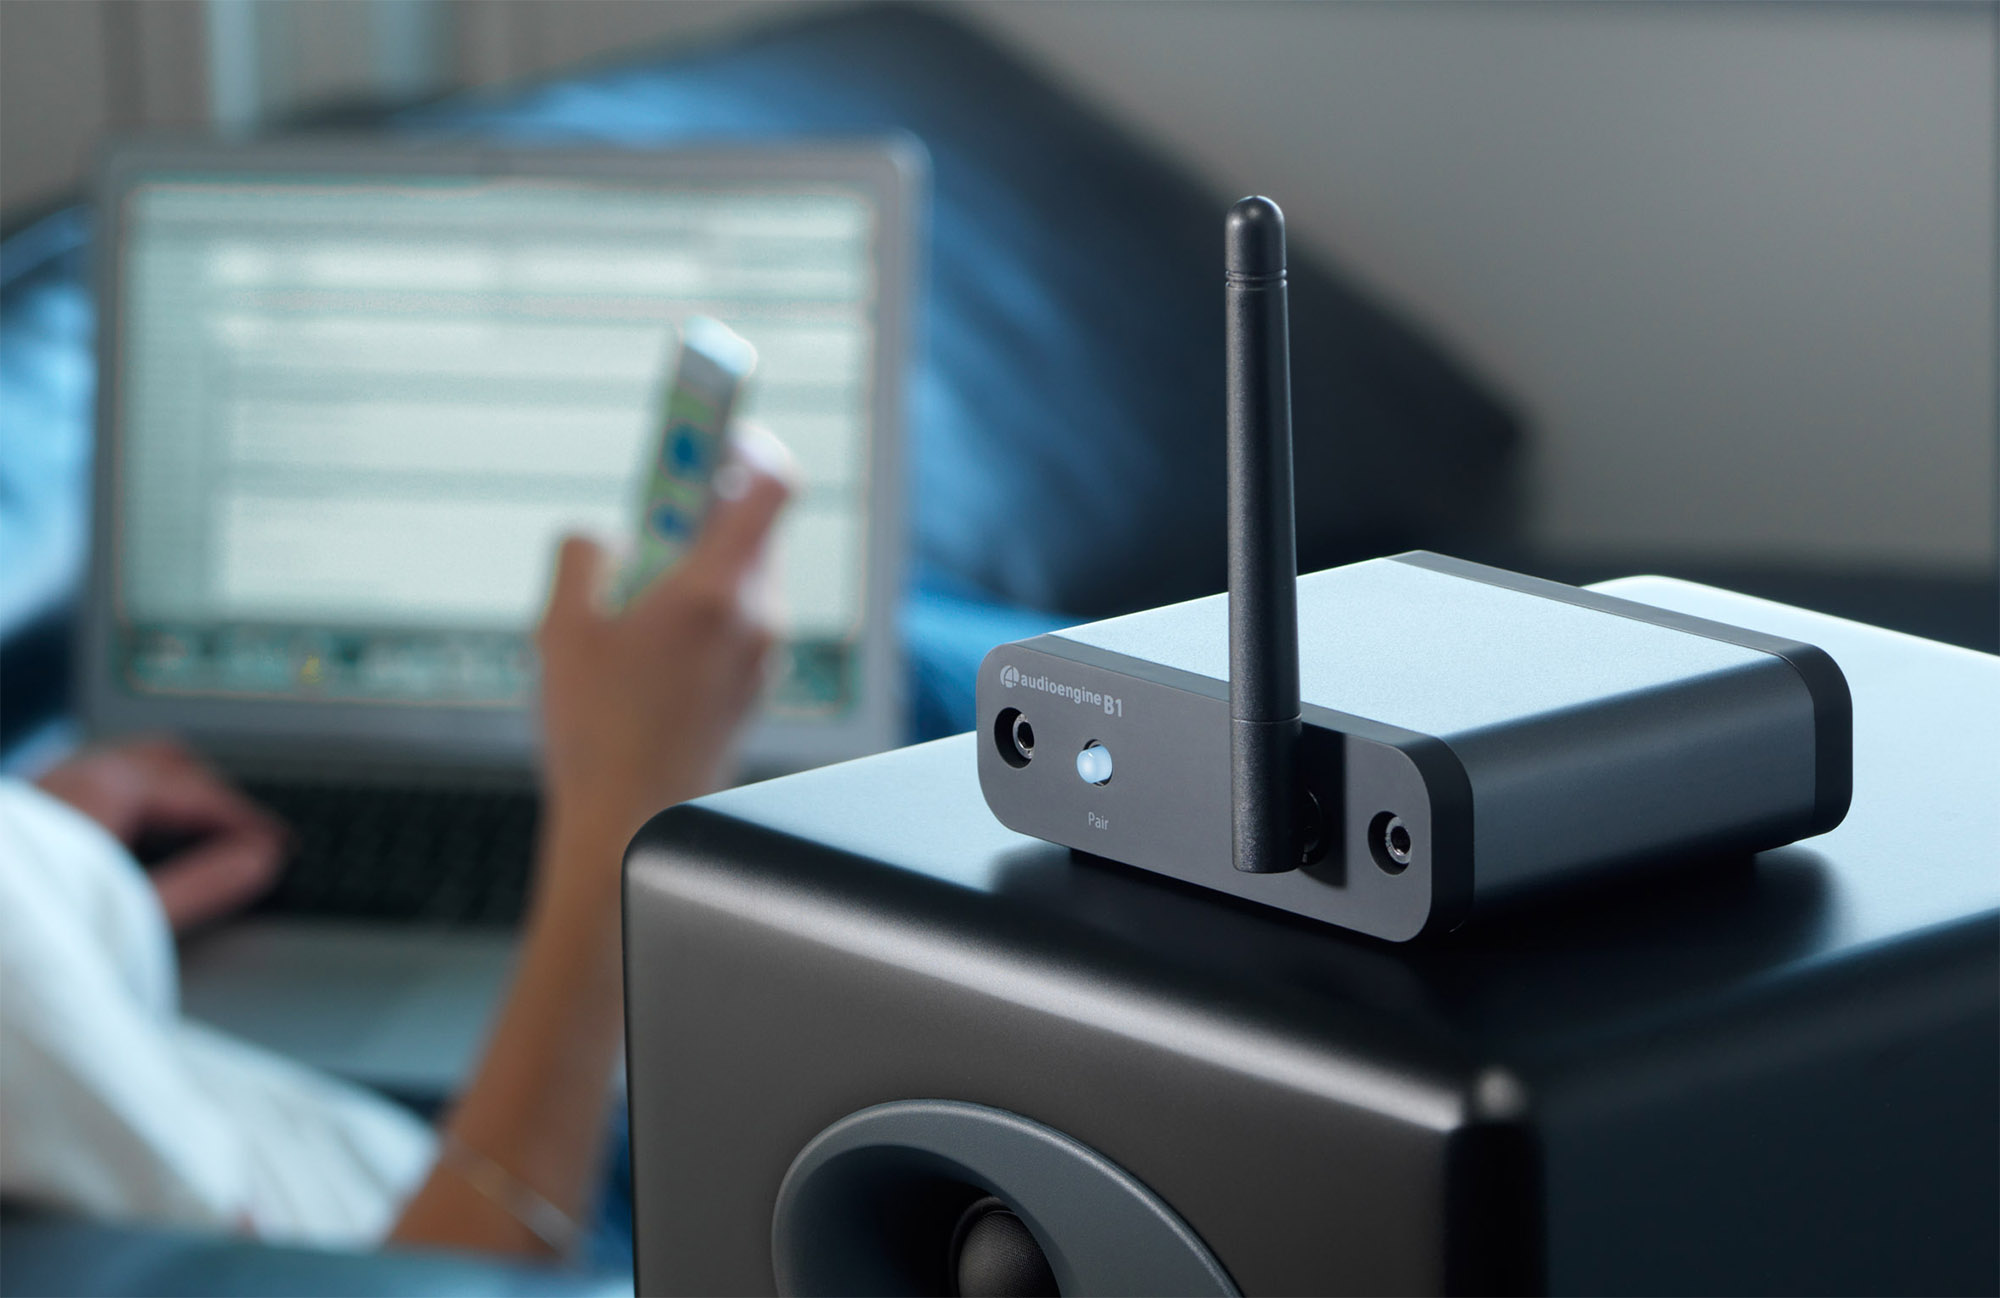 Review: Audioengine\'s B1 Bluetooth Music Receiver